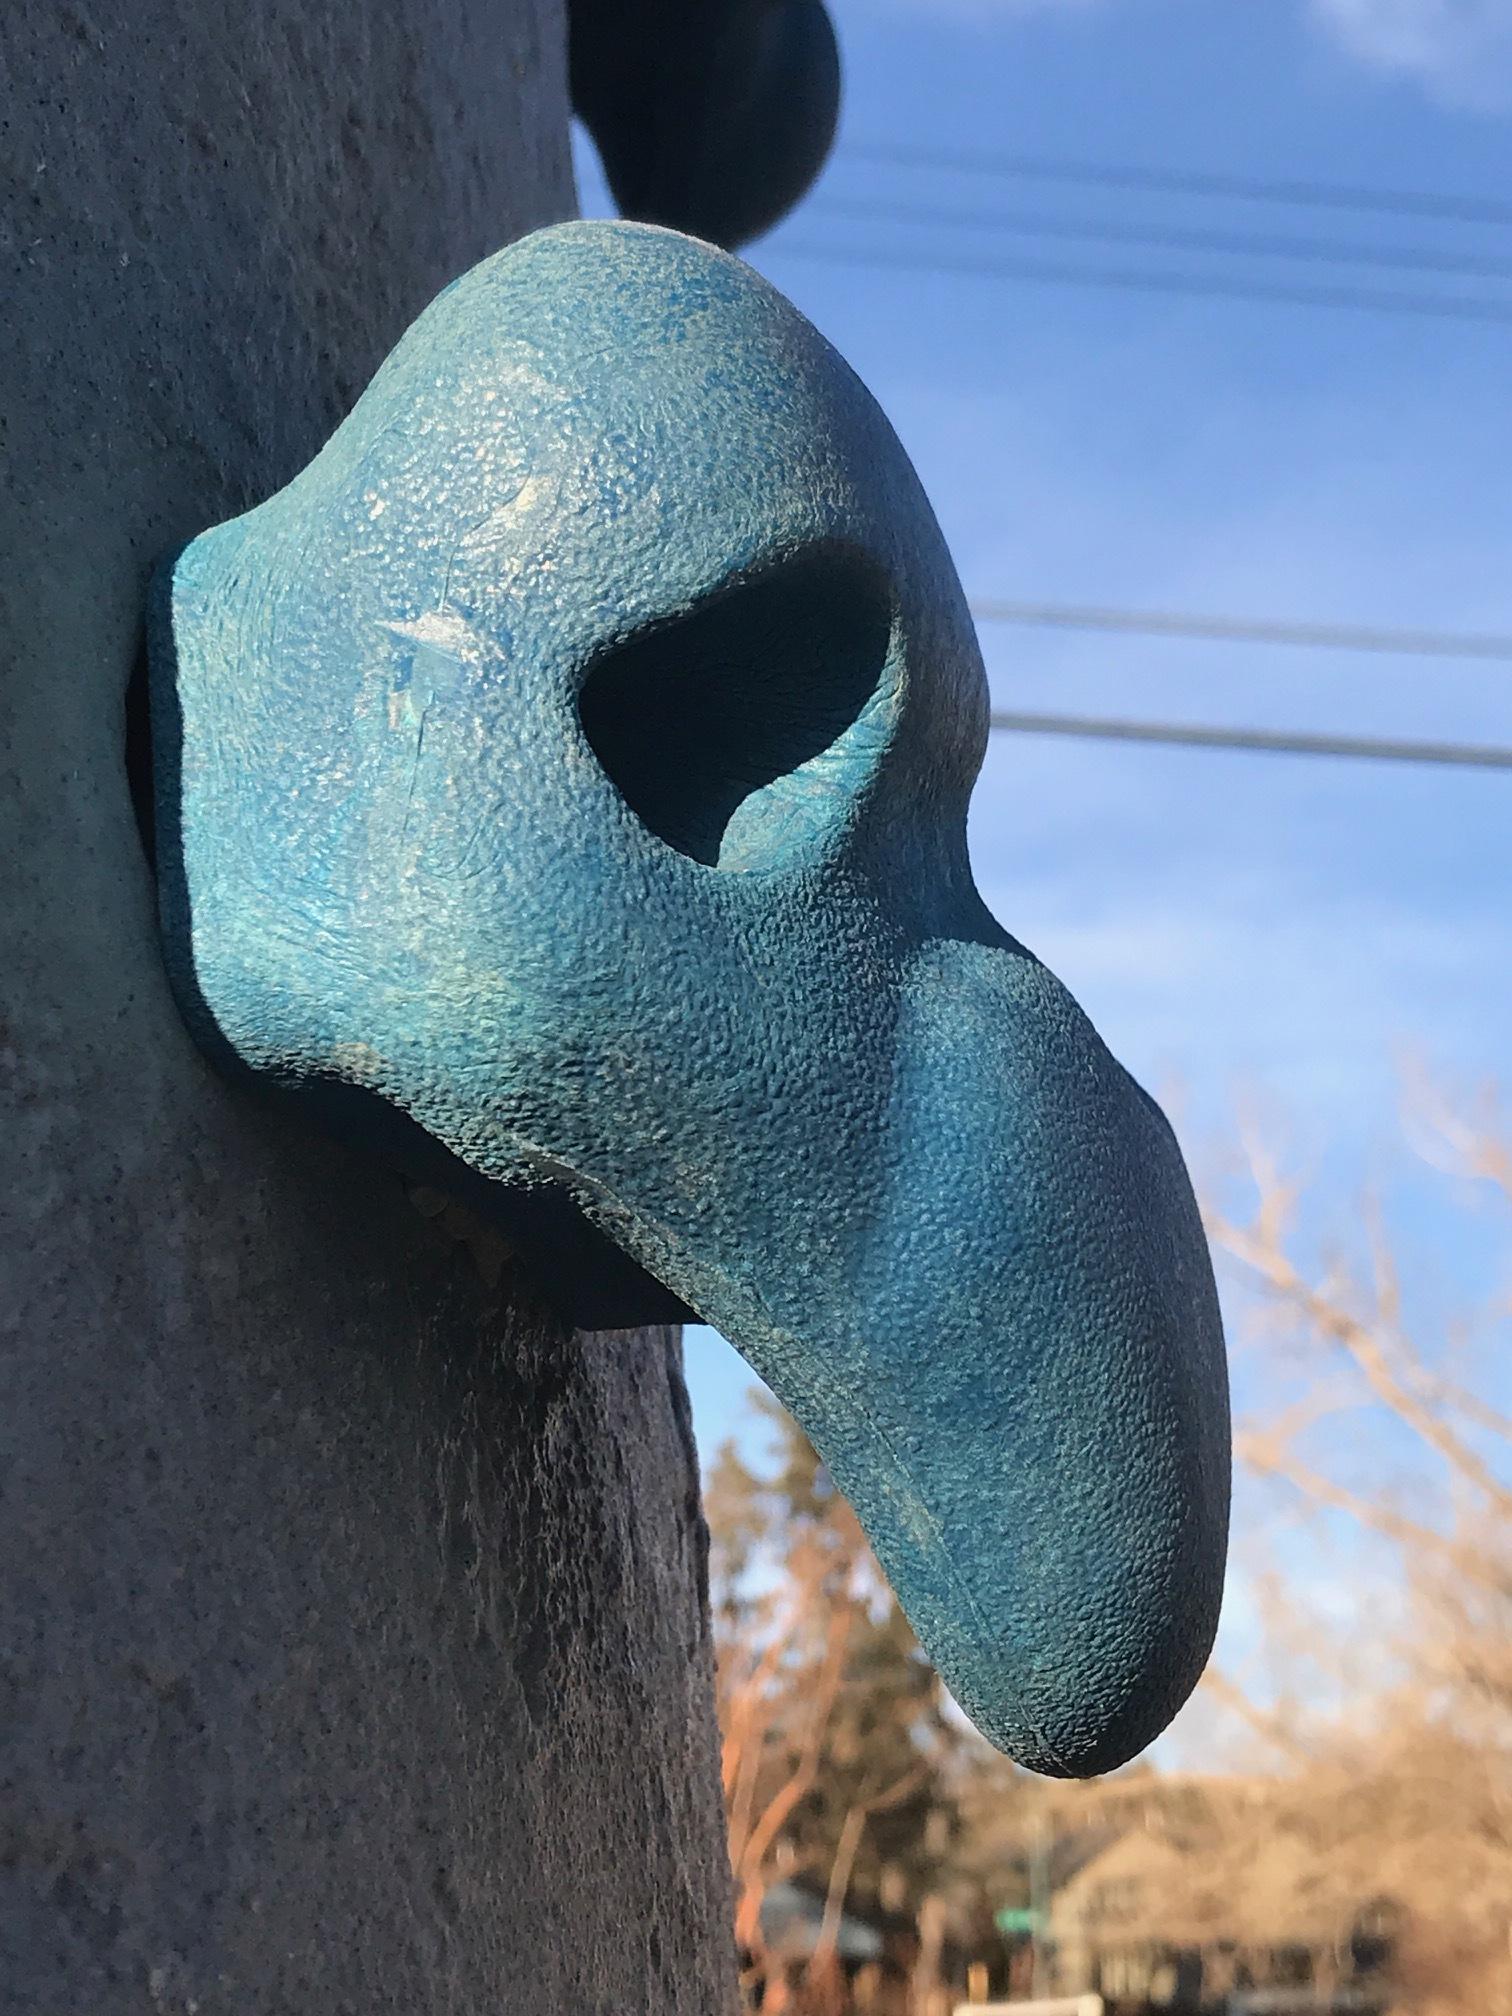 Blue Bird, Calgary